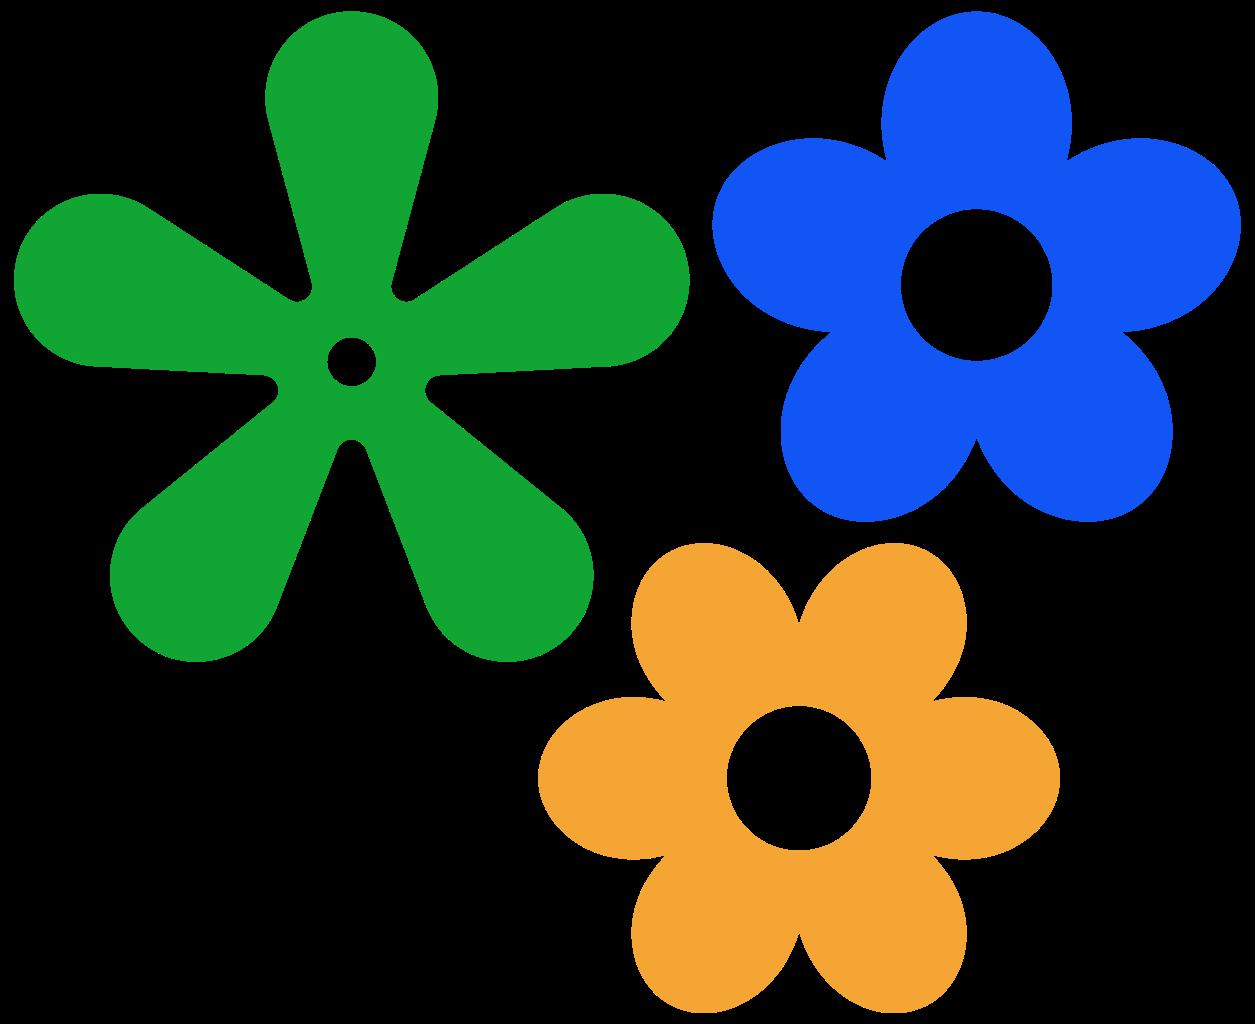 Hippie clipart svg. File retro flower icon